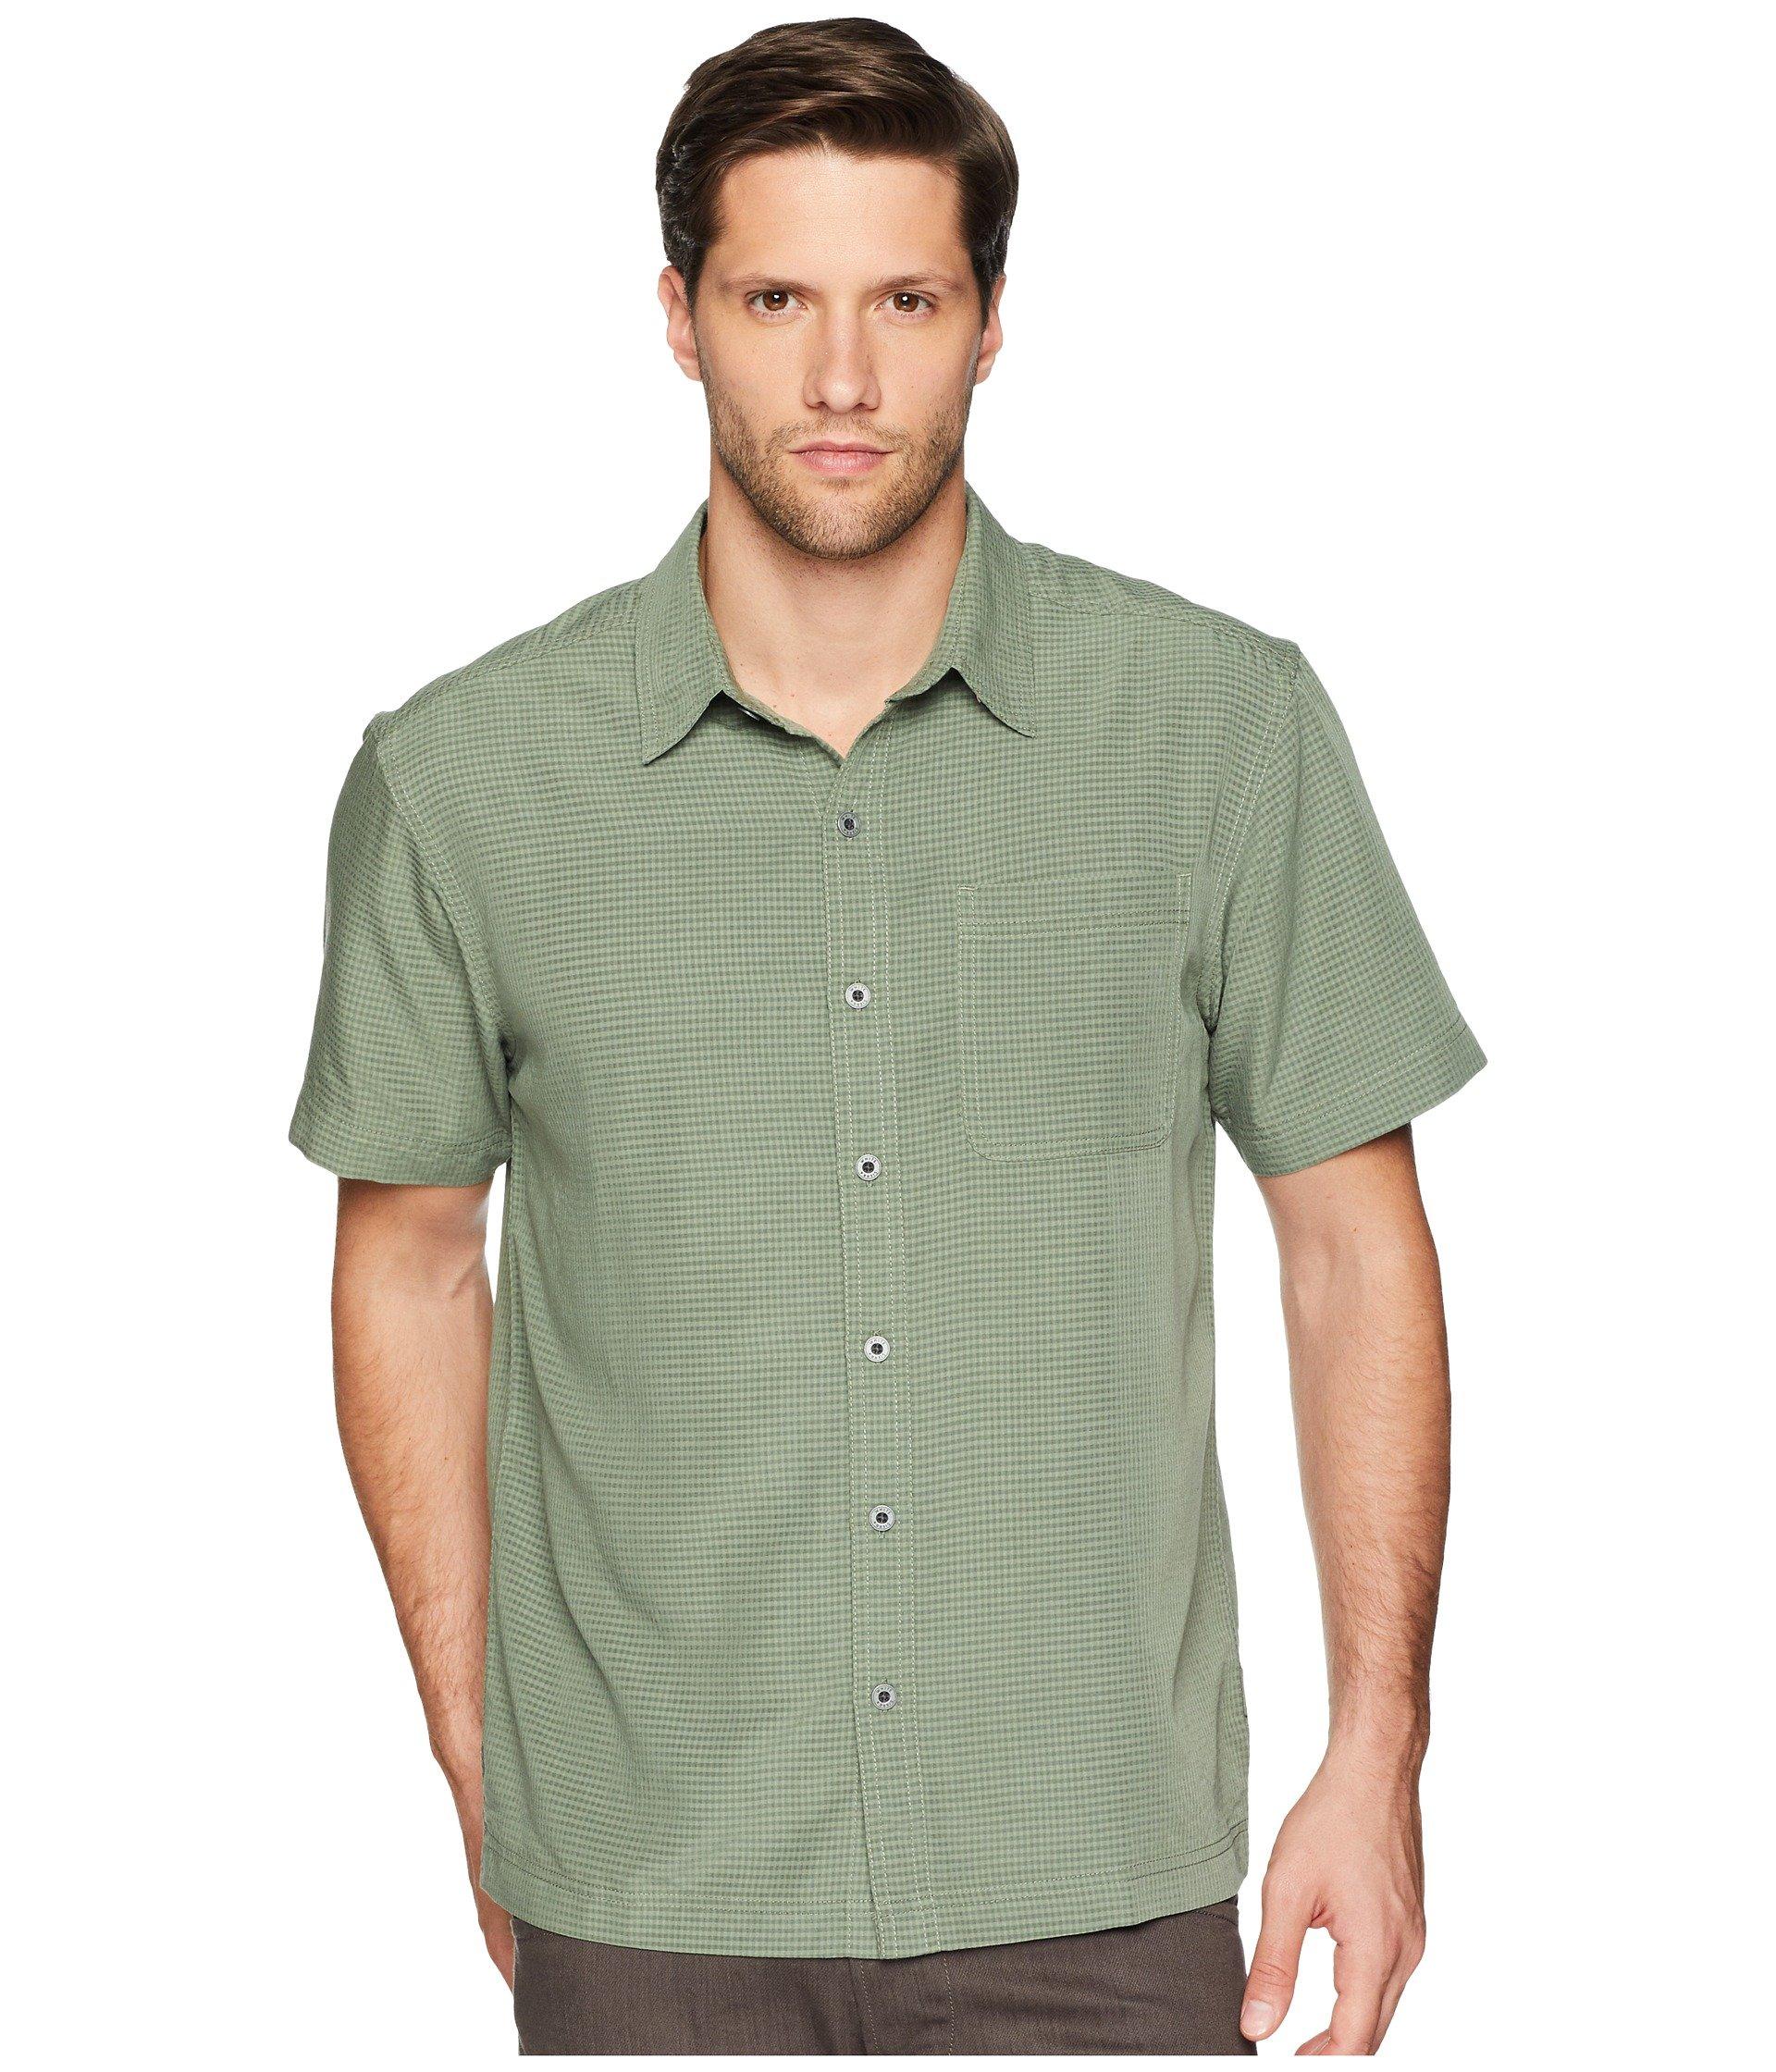 Camiseta Tipo Polo para Hombre White Sierra Sandpiper Short Sleeve Shirt  + White Sierra en VeoyCompro.net